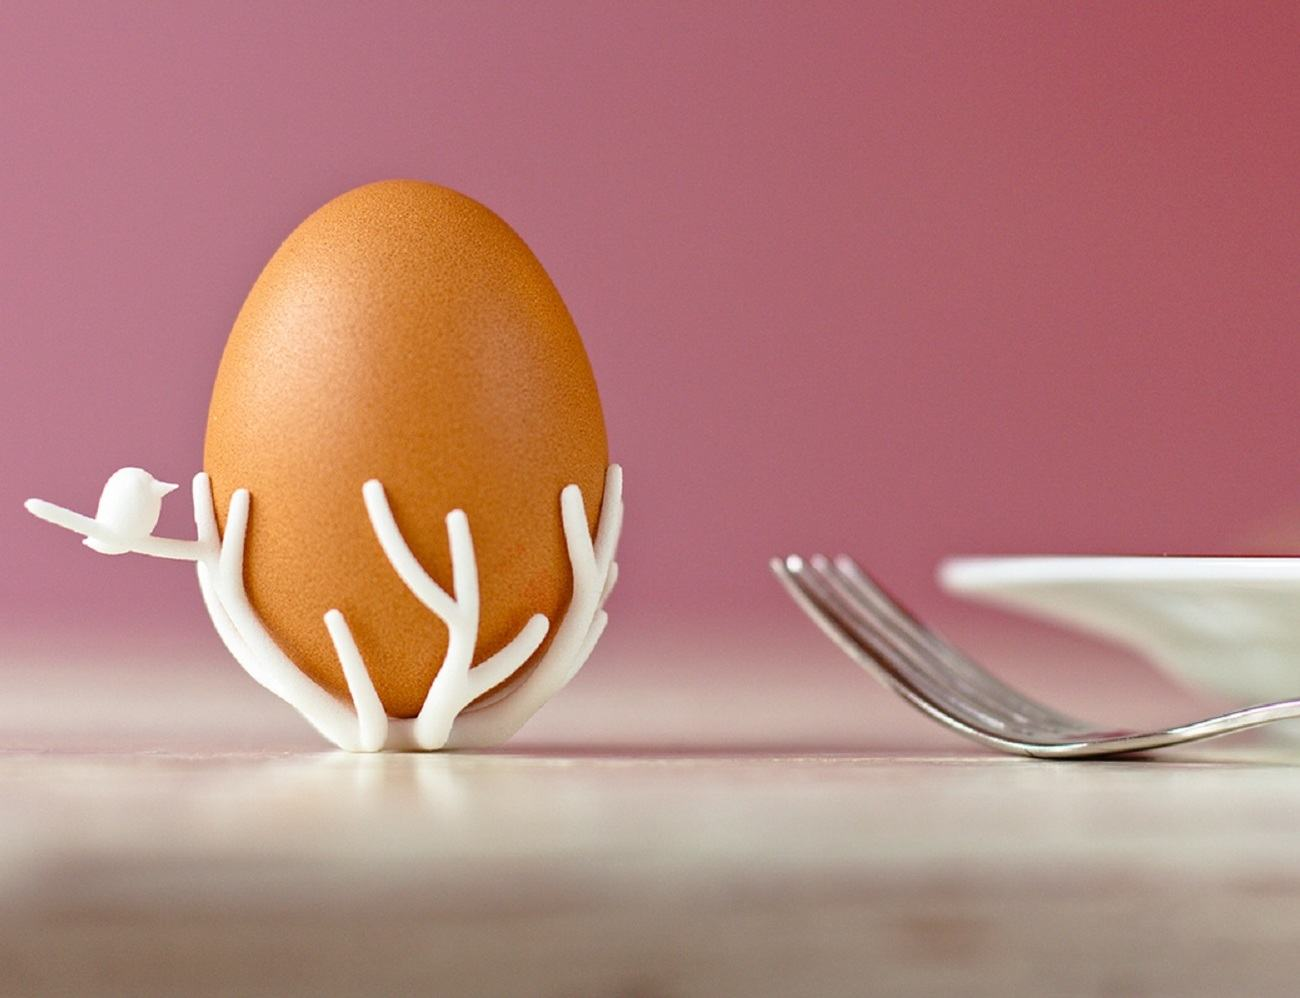 Birdsnest Eggcup – 3D Printed Eggcup for Your Breakfast Table